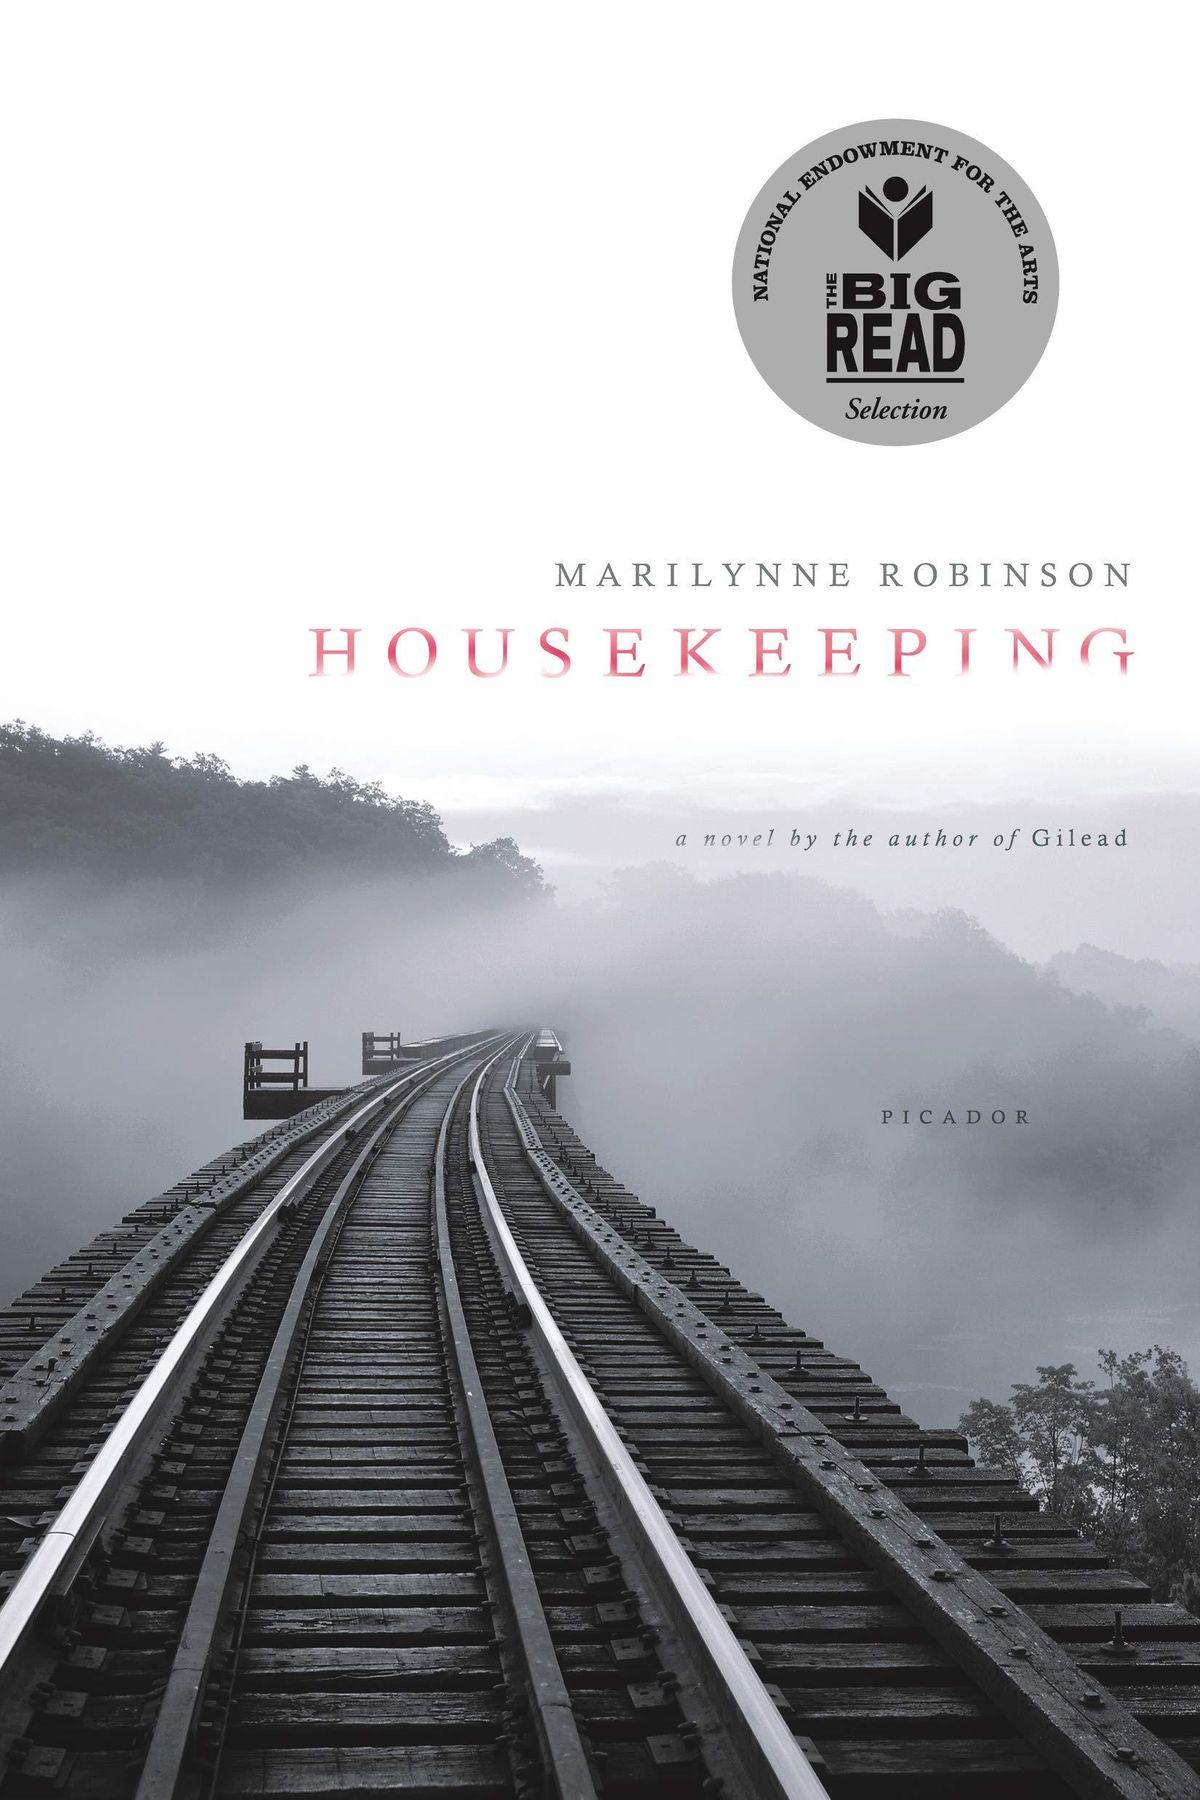 marilynne robinson housekeeping a novel